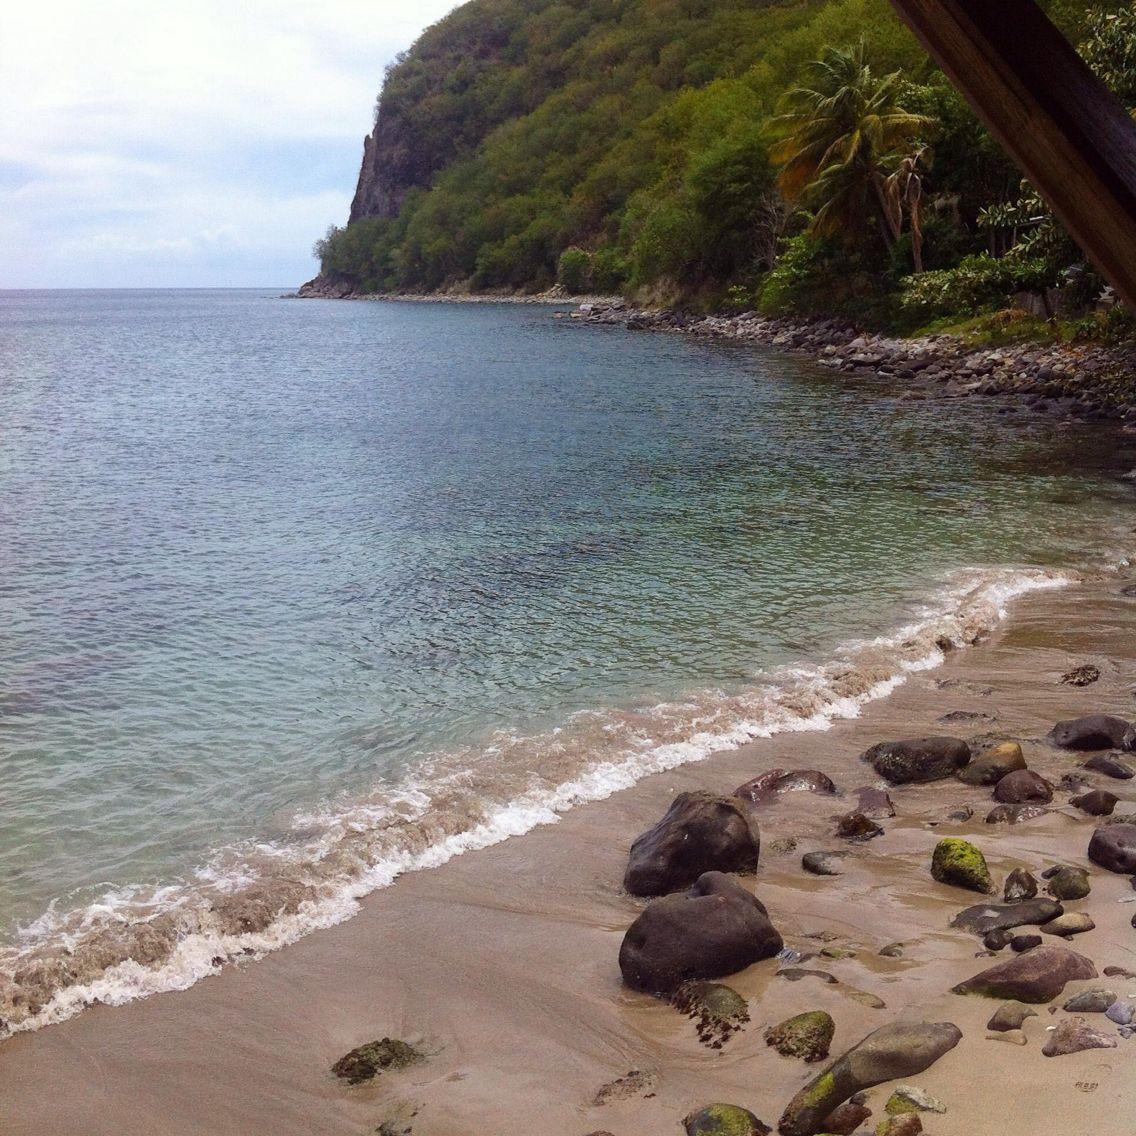 Guadeloupe Beach: Guadeloupe, Deshaies, Photos